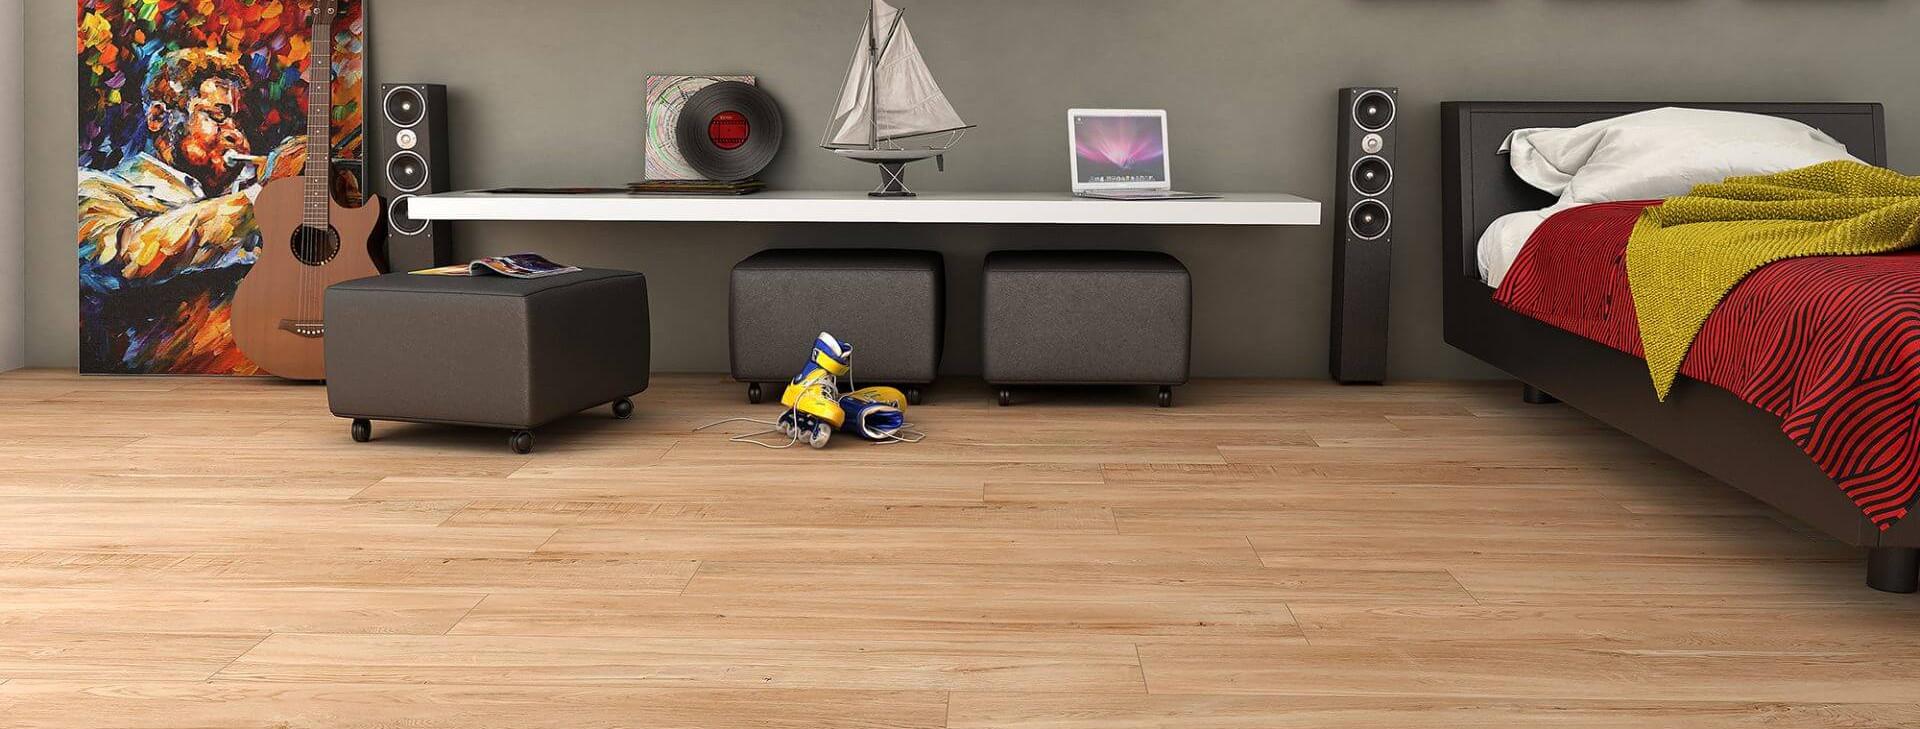 porcelanato-amadeirado-piso-madeira-casa-apartamento